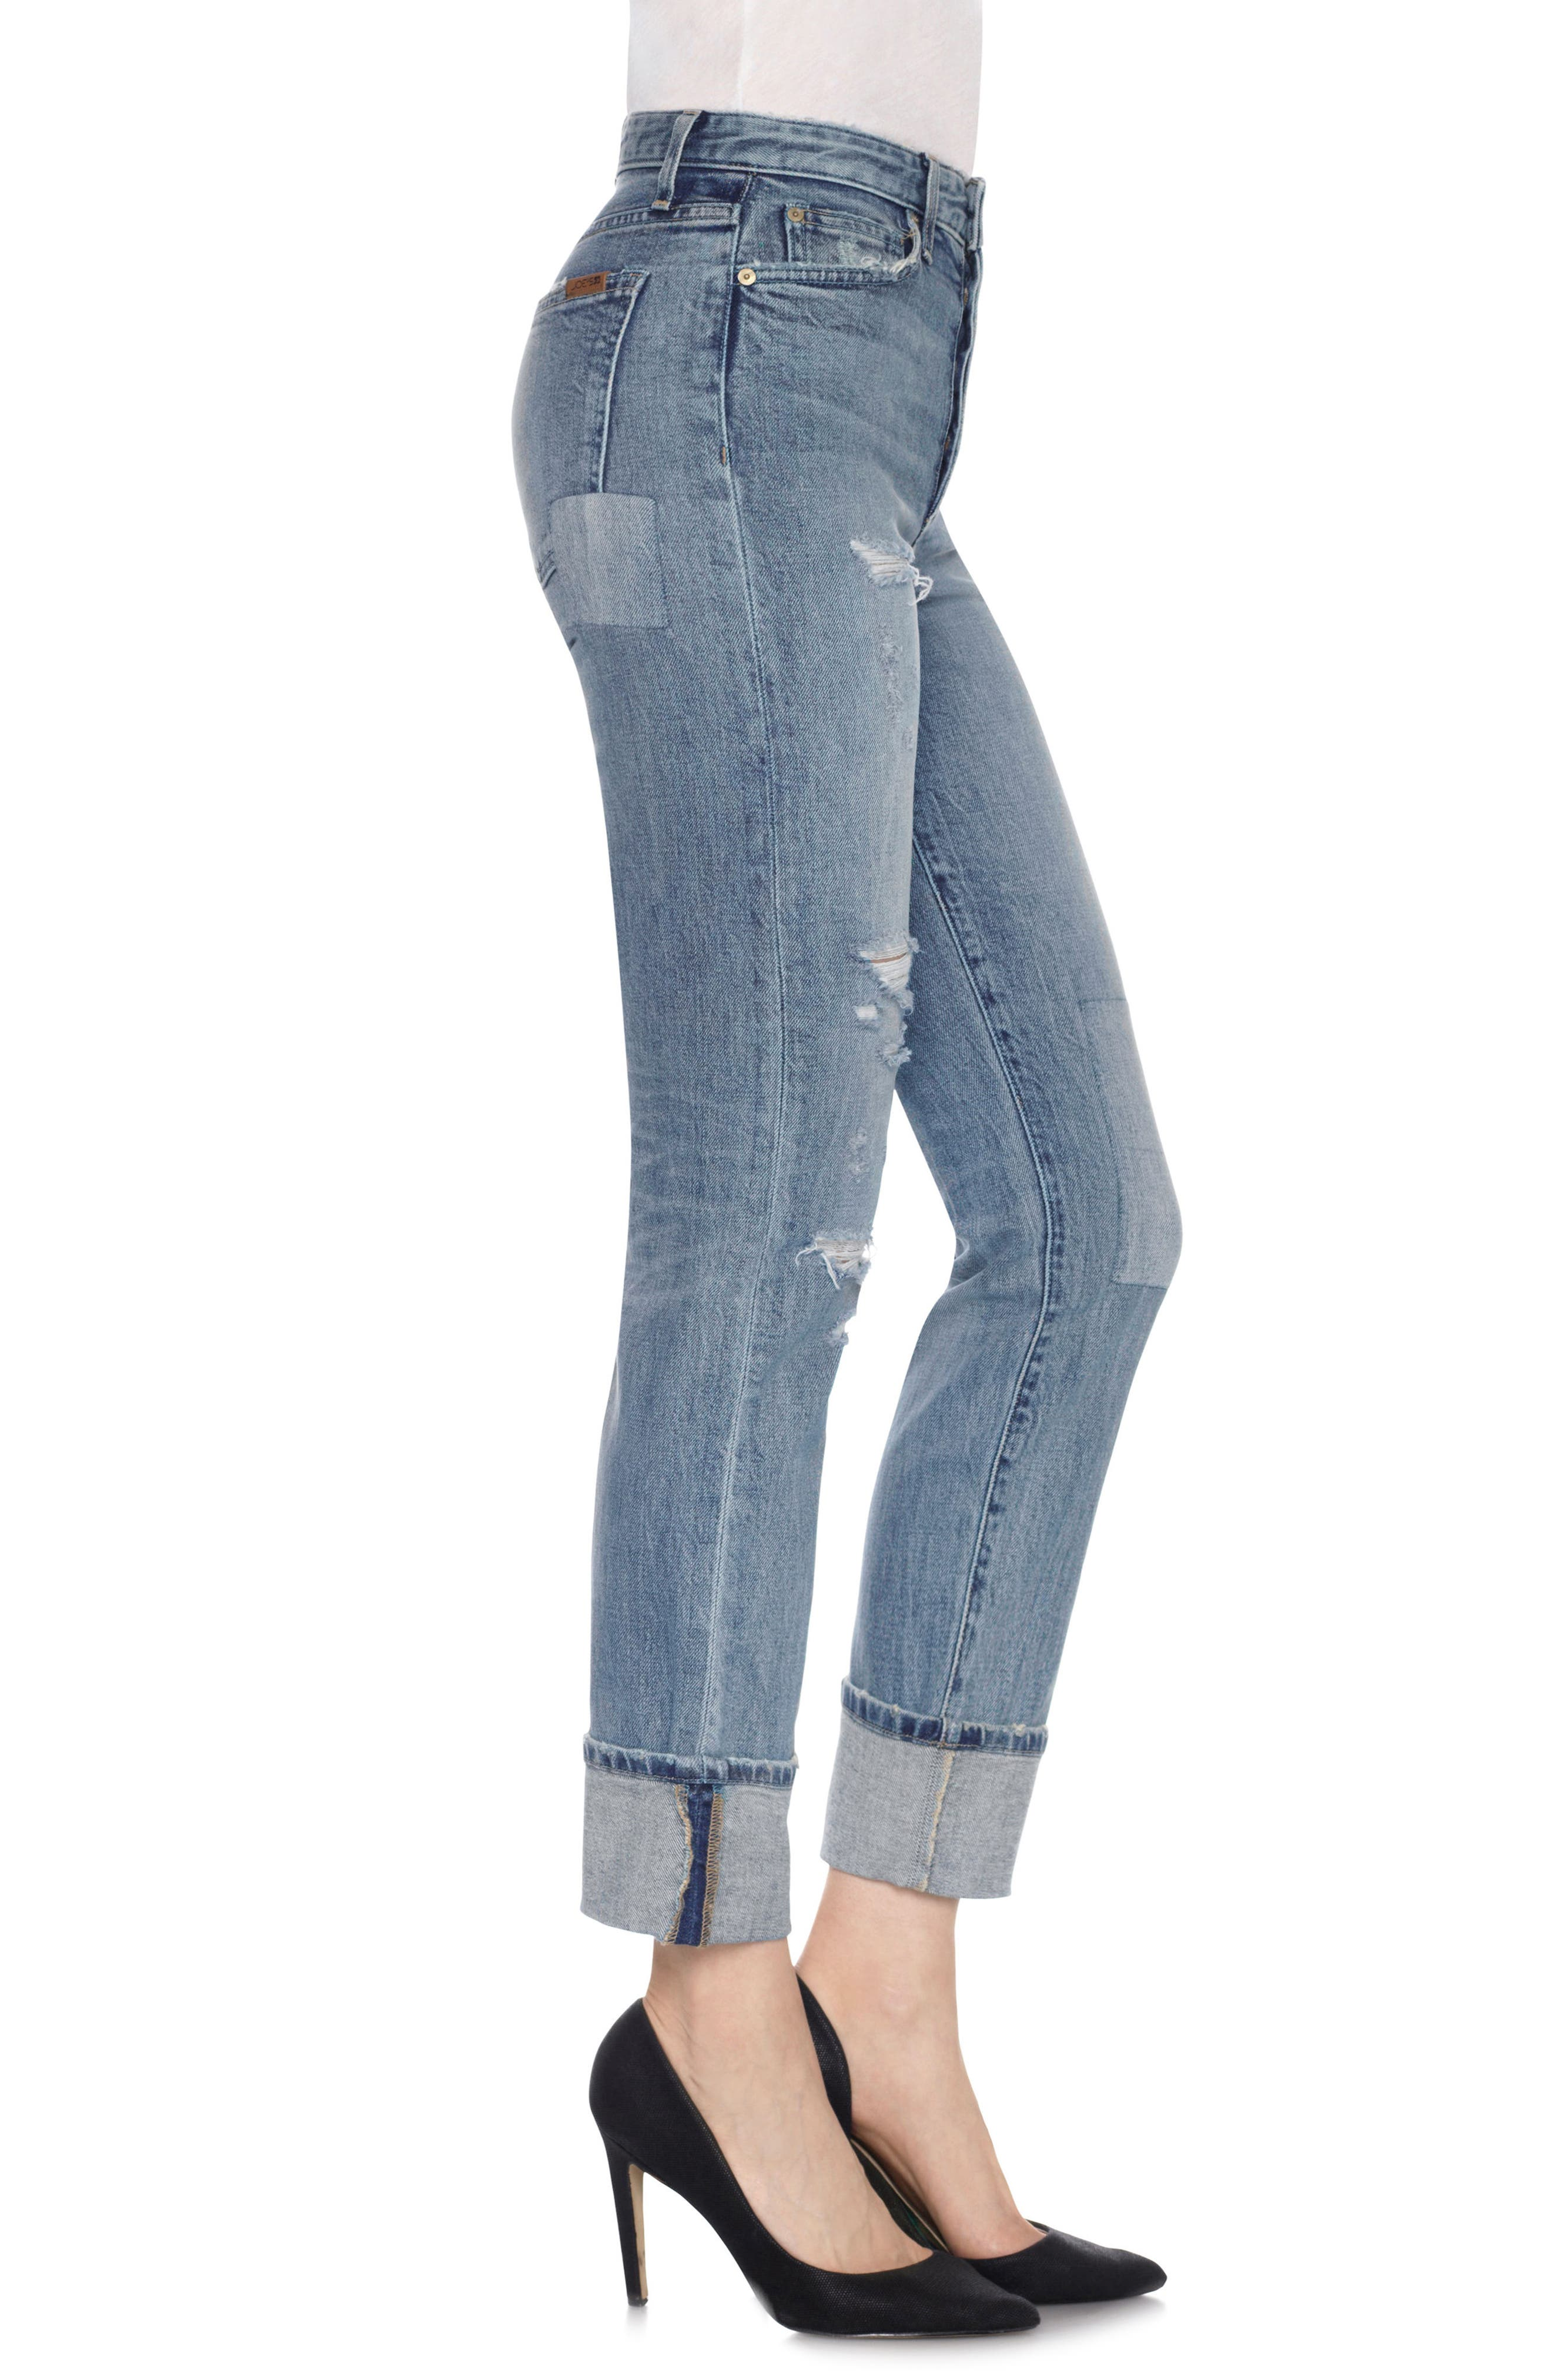 Taylor Hill x Joe's Debbie Cuff Straight Leg Jeans,                             Alternate thumbnail 3, color,                             430